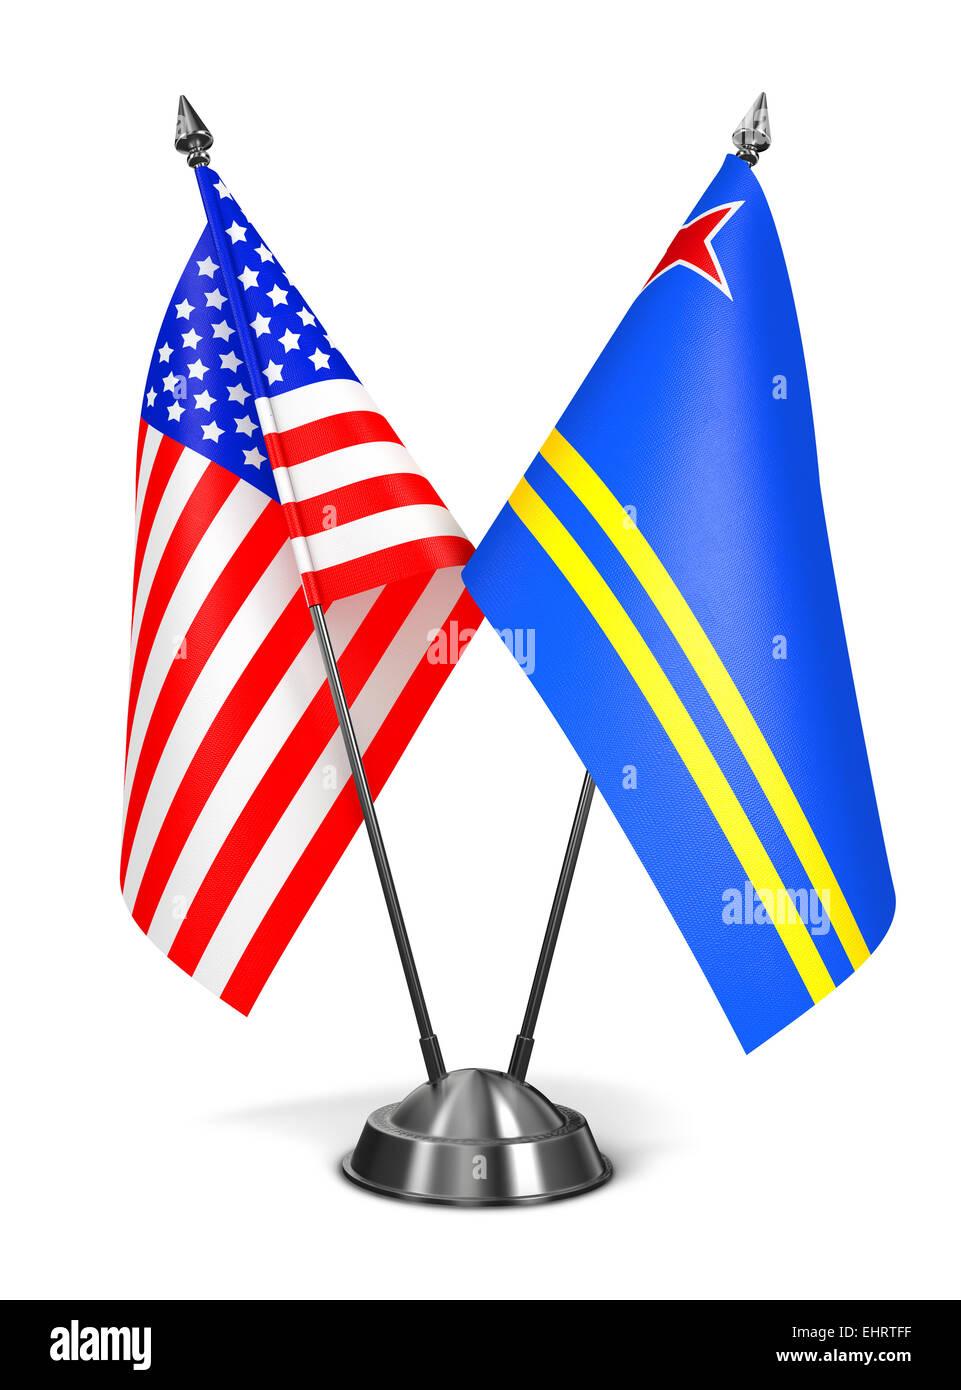 USA and Aruba - Miniature Flags. Stock Photo